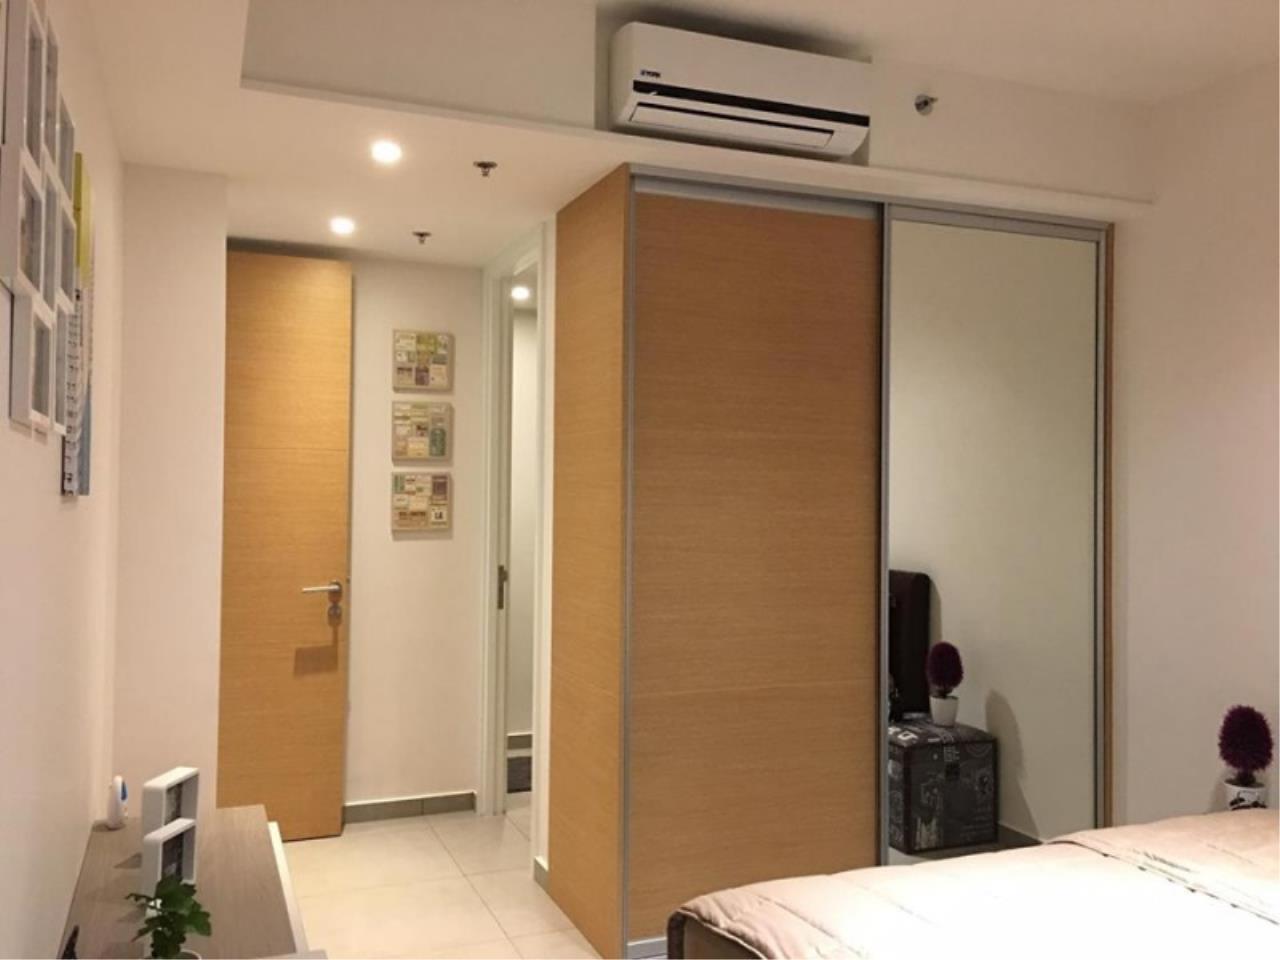 Century21 Skylux Agency's The Lofts Ekkamai / Condo For Sale / 1 Bedroom / 51 SQM / BTS Ekkamai / Bangkok 5